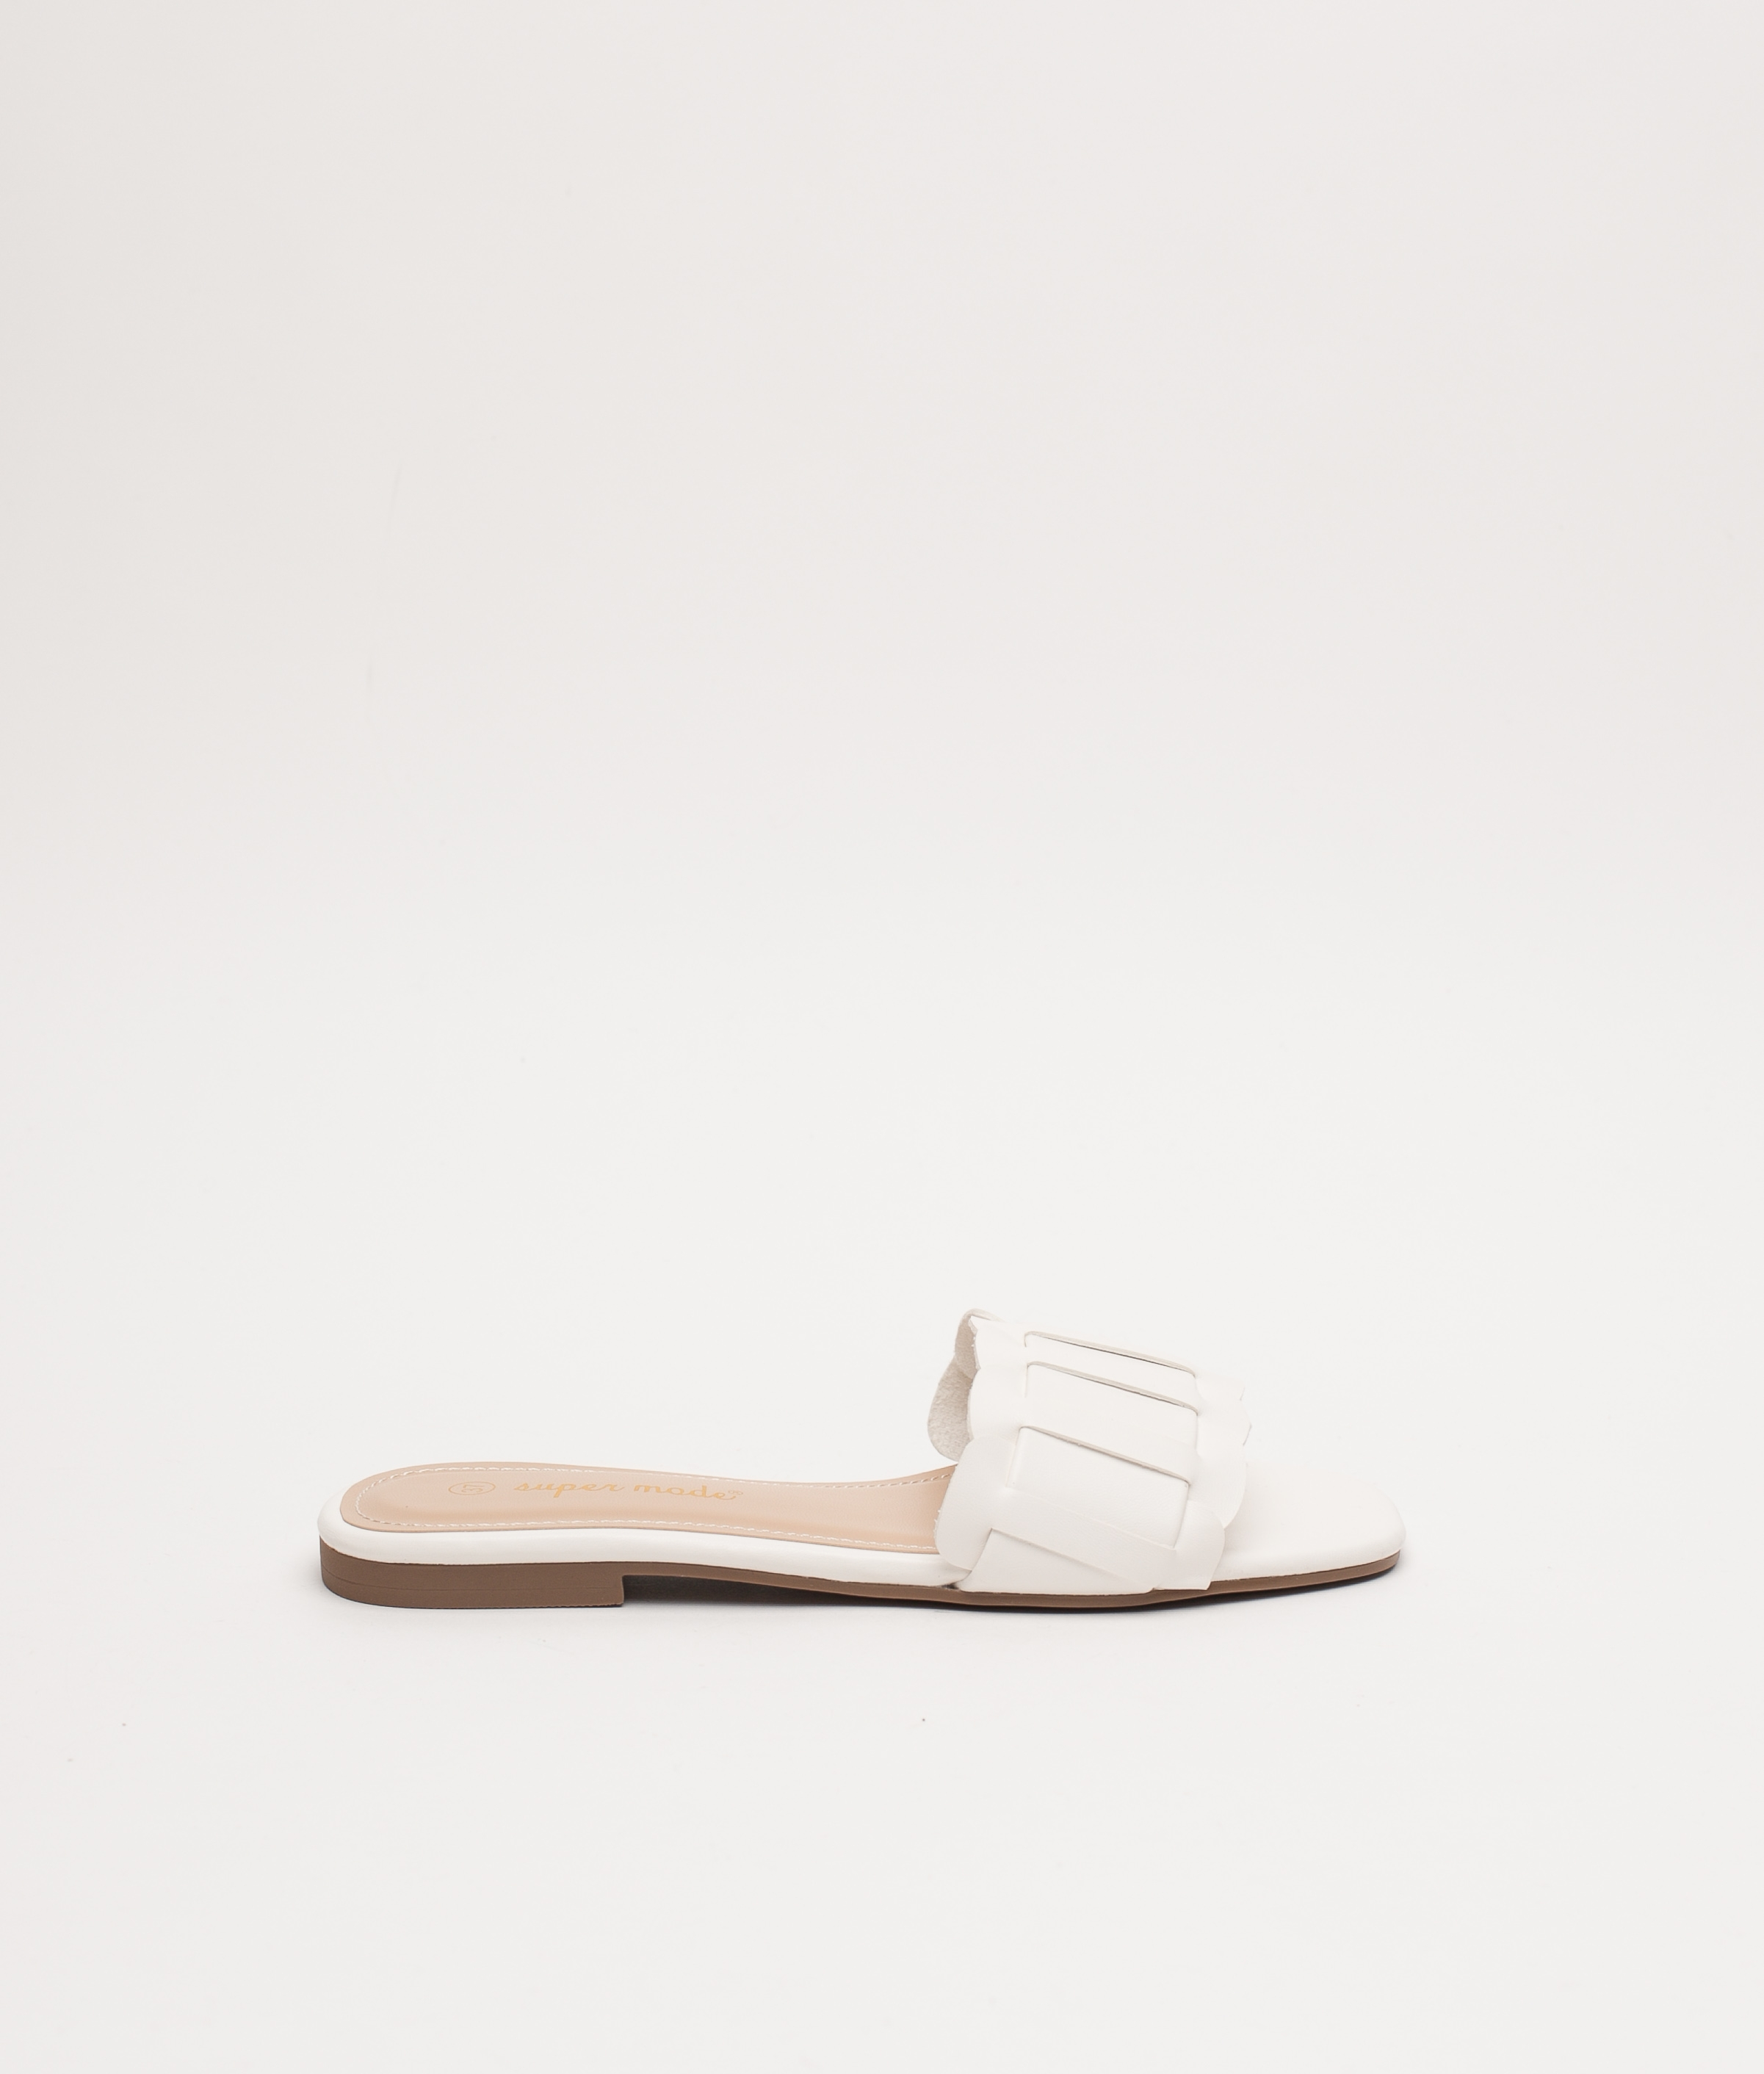 ORURO SANDAL - WHITE